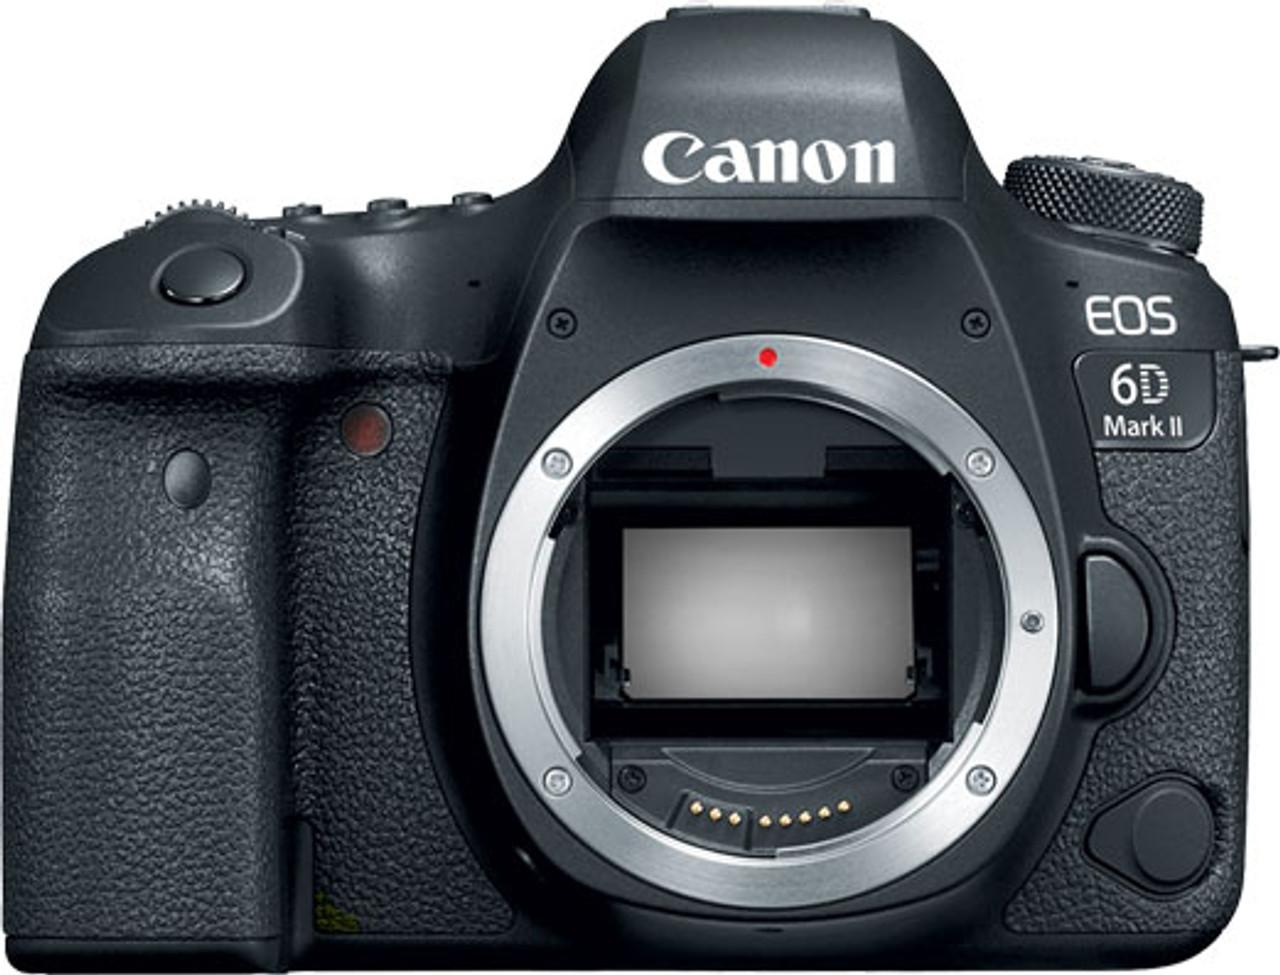 Canon EOS 6D Mark II Digital SLR Camera - Body Only - Black